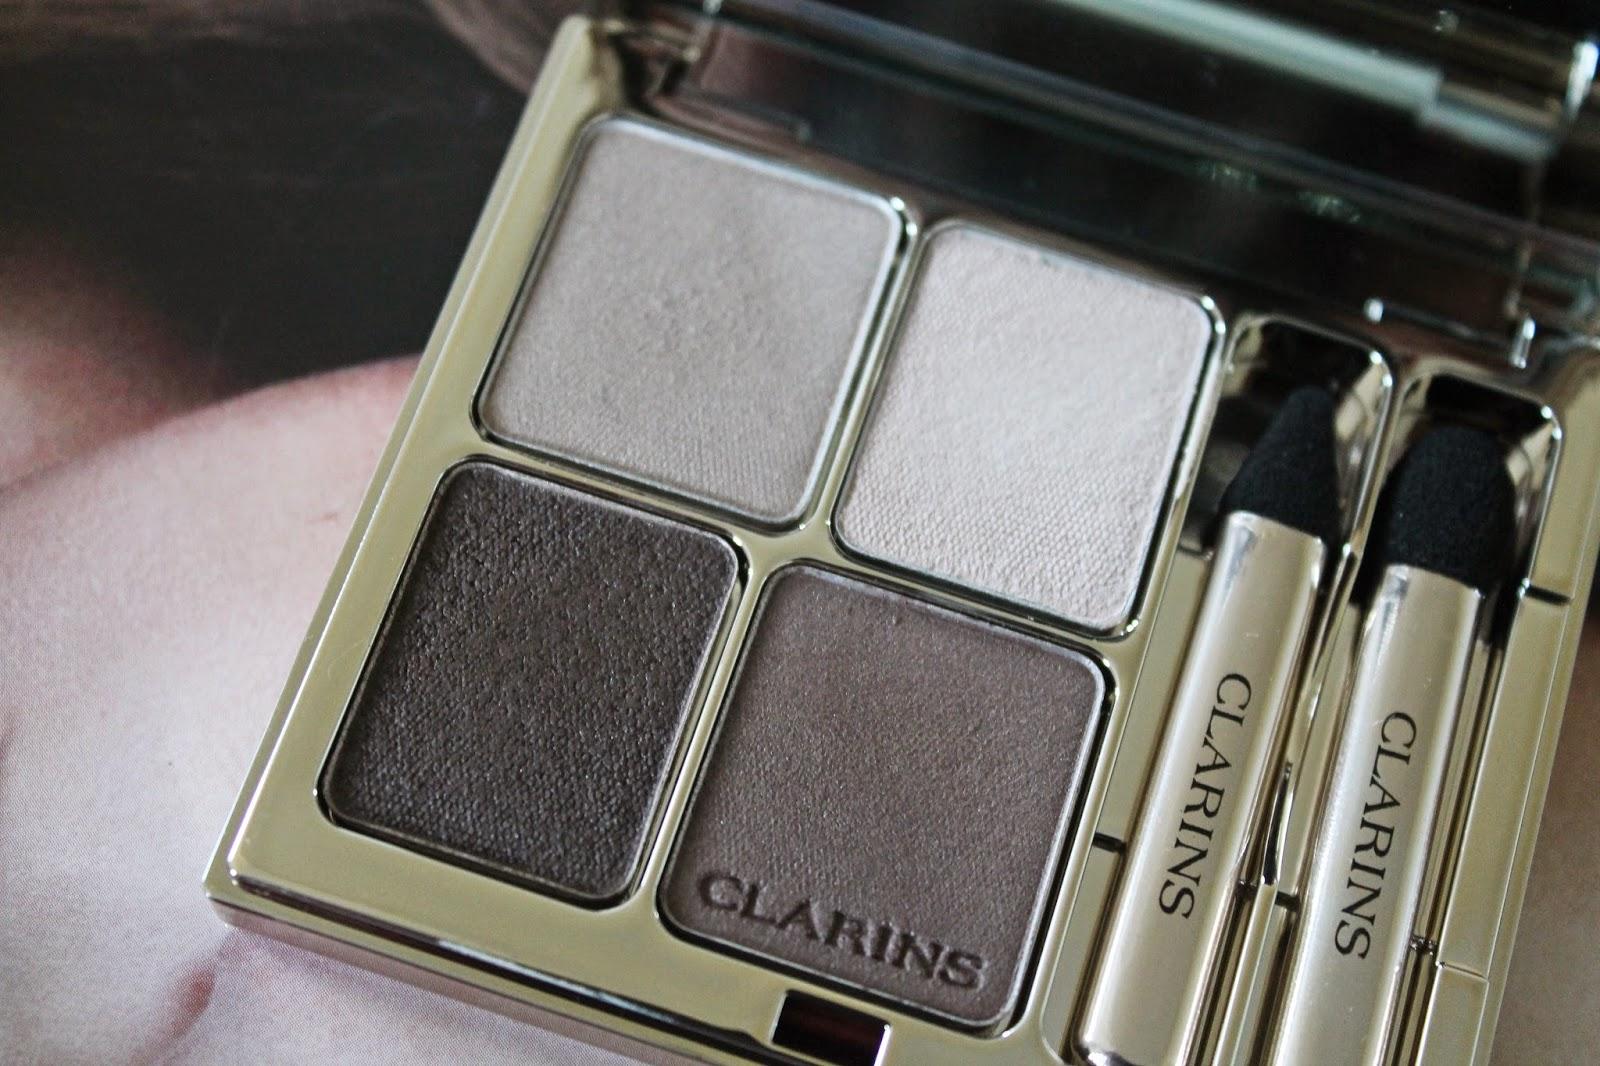 Clarins Eye Quartet Mineral Palette in Skin Tones - Aspiring Londoner